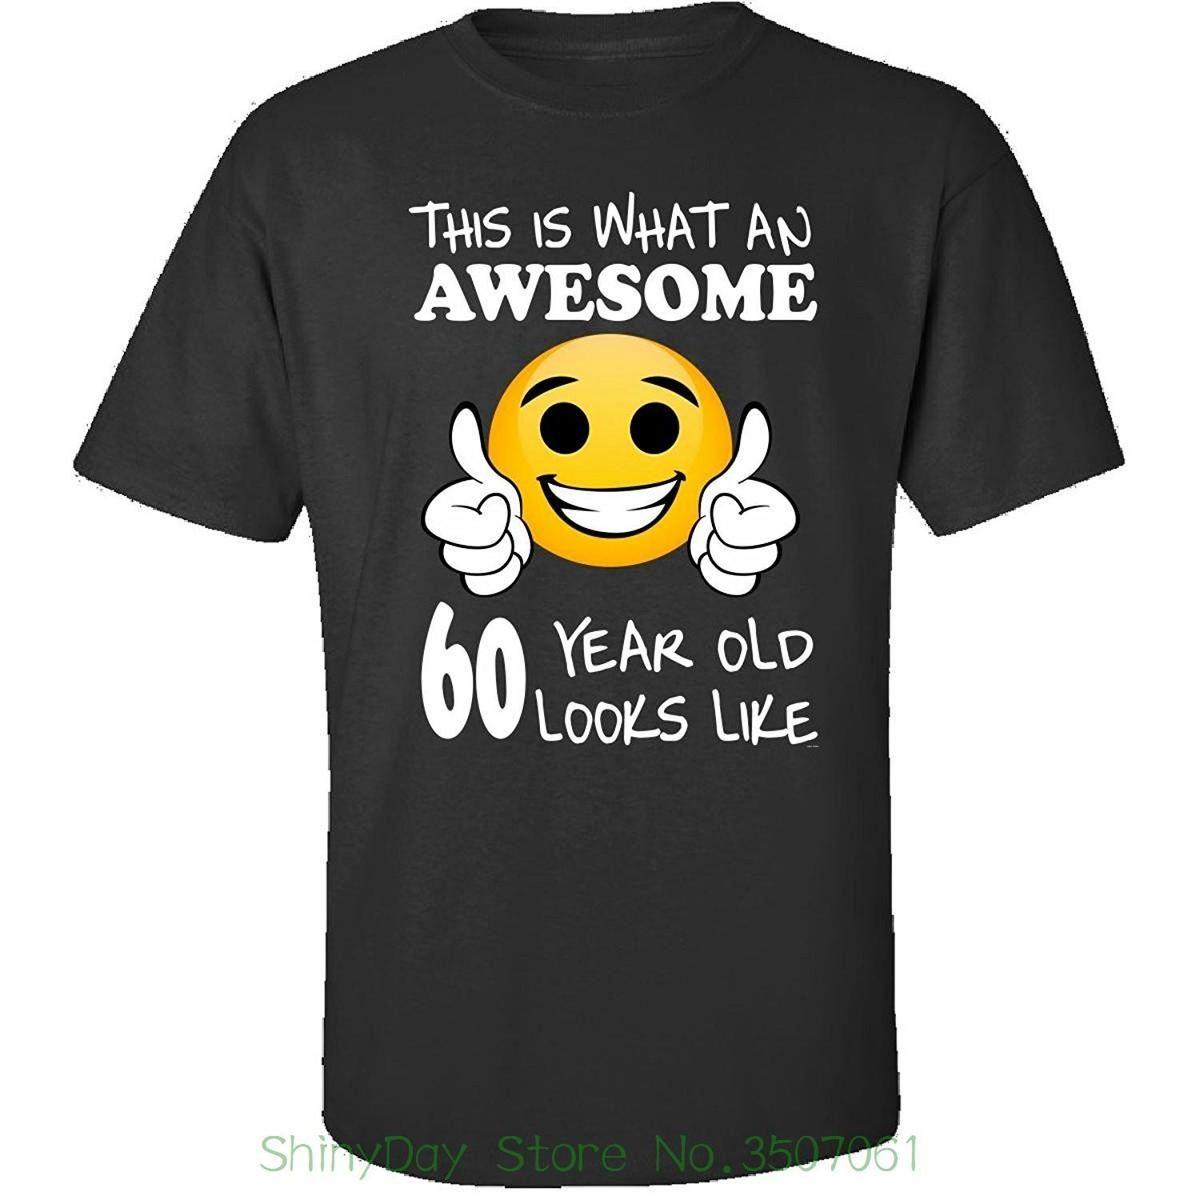 Tops Summer Cool Funny T Shirt Emoji Birthday 60th Presents Men 60 Year Old Gift Adult Crazy Tshirts Buy Tshirt From Jie022 1467